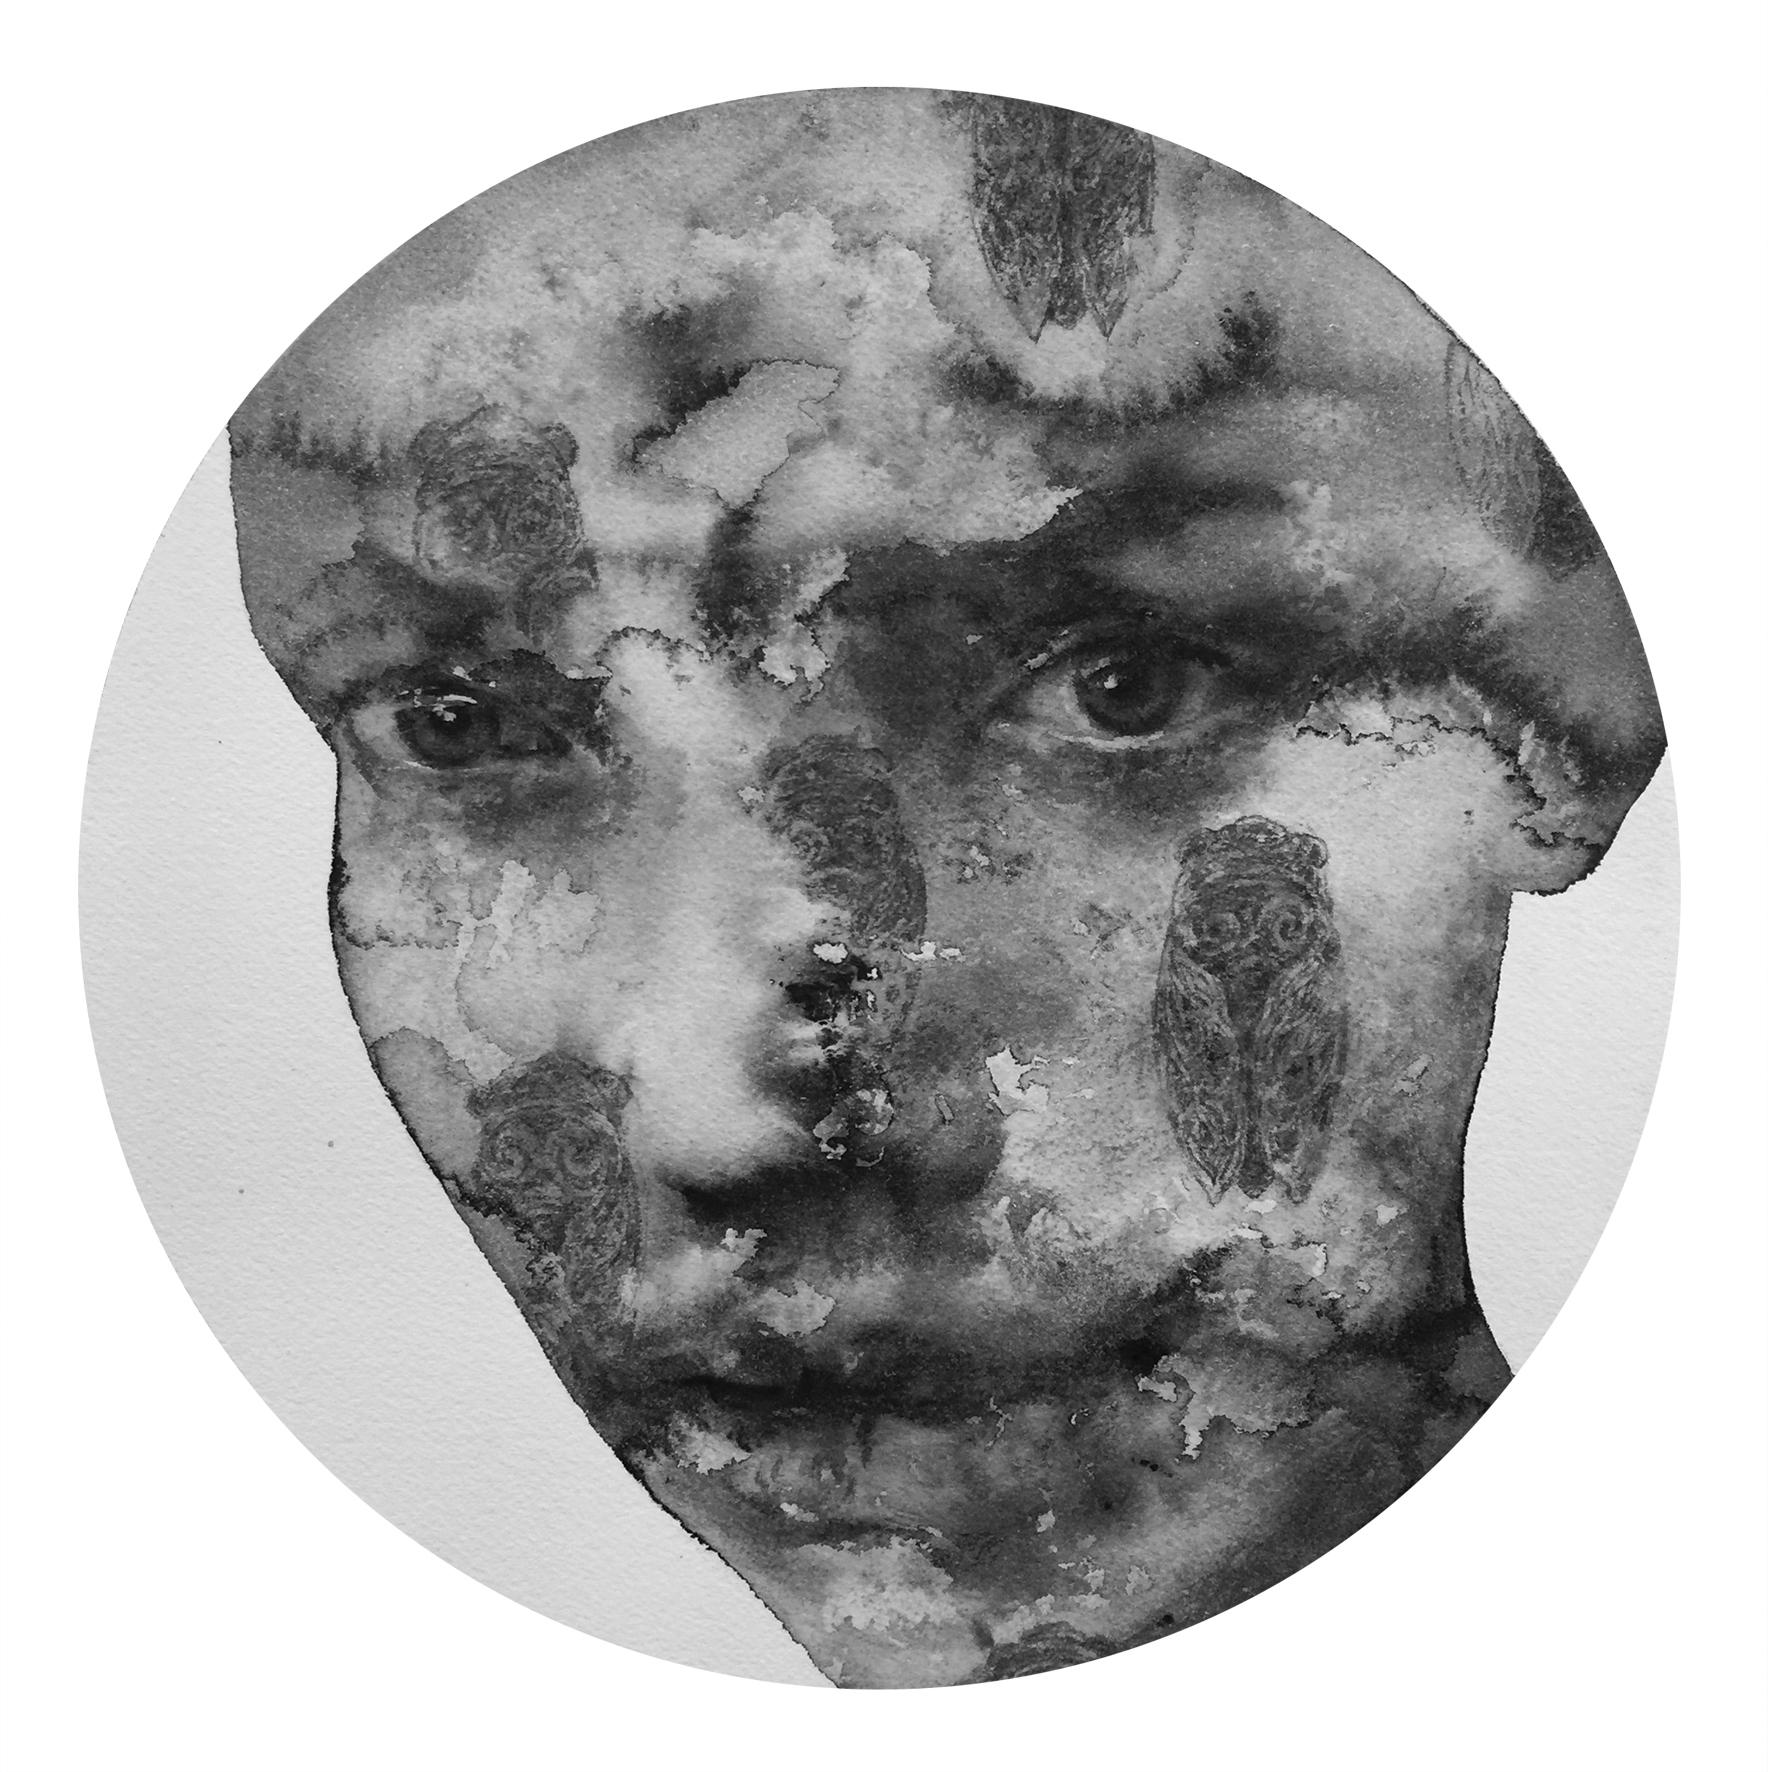 Reflection #8 (Contemporary Chinese Artist Shanlin Ye at Jim Kempner Fine Art)